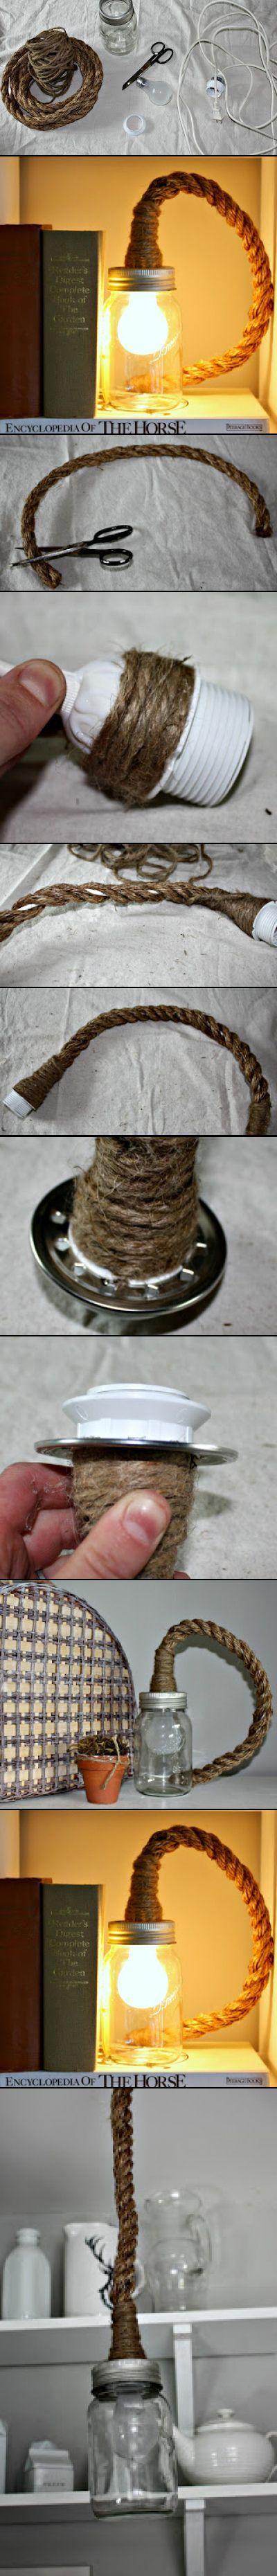 DIY Mason Jar Rope Light |